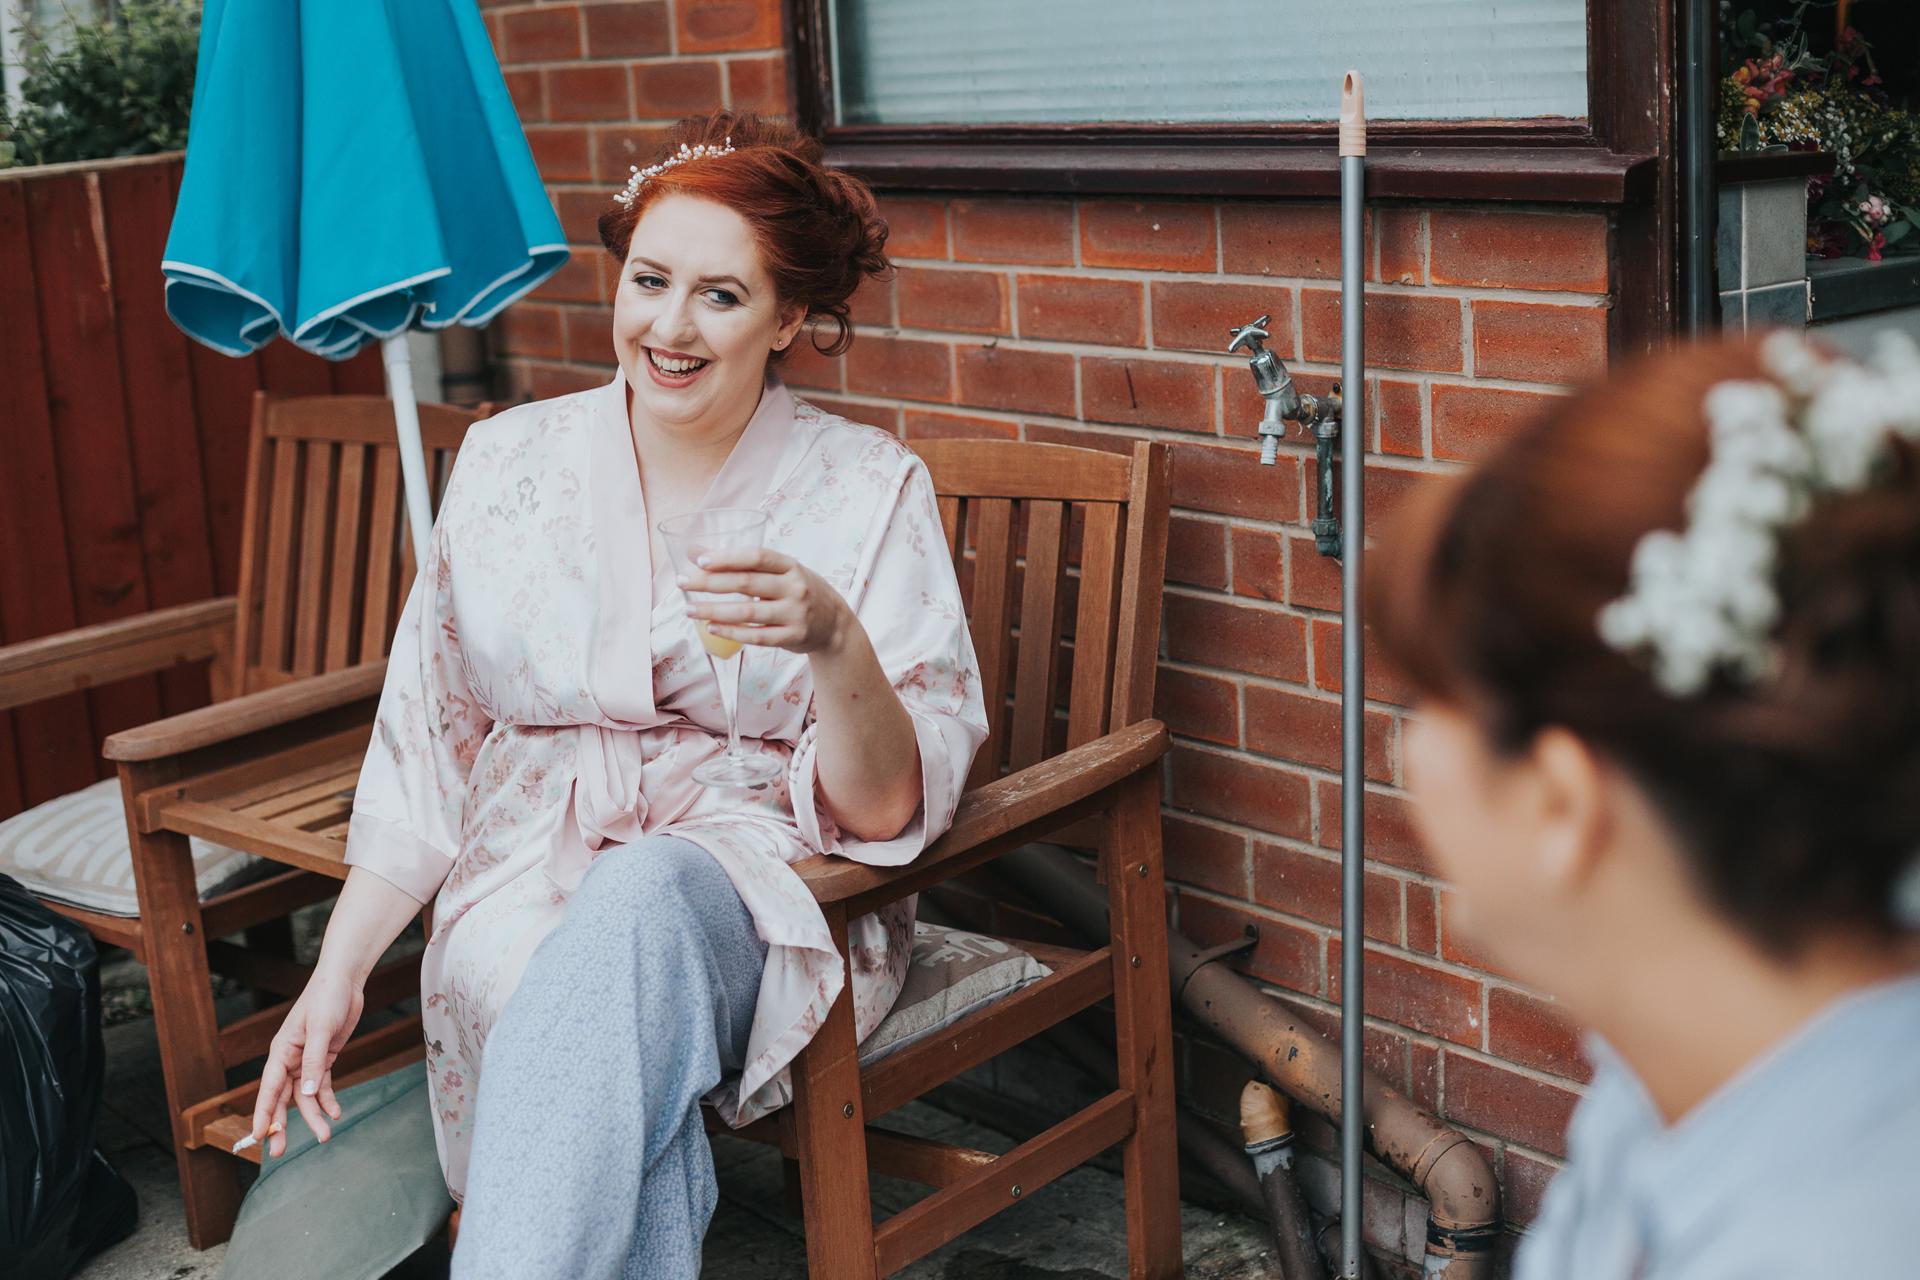 Bride having a fag and bucks fizz break in the kitchen.